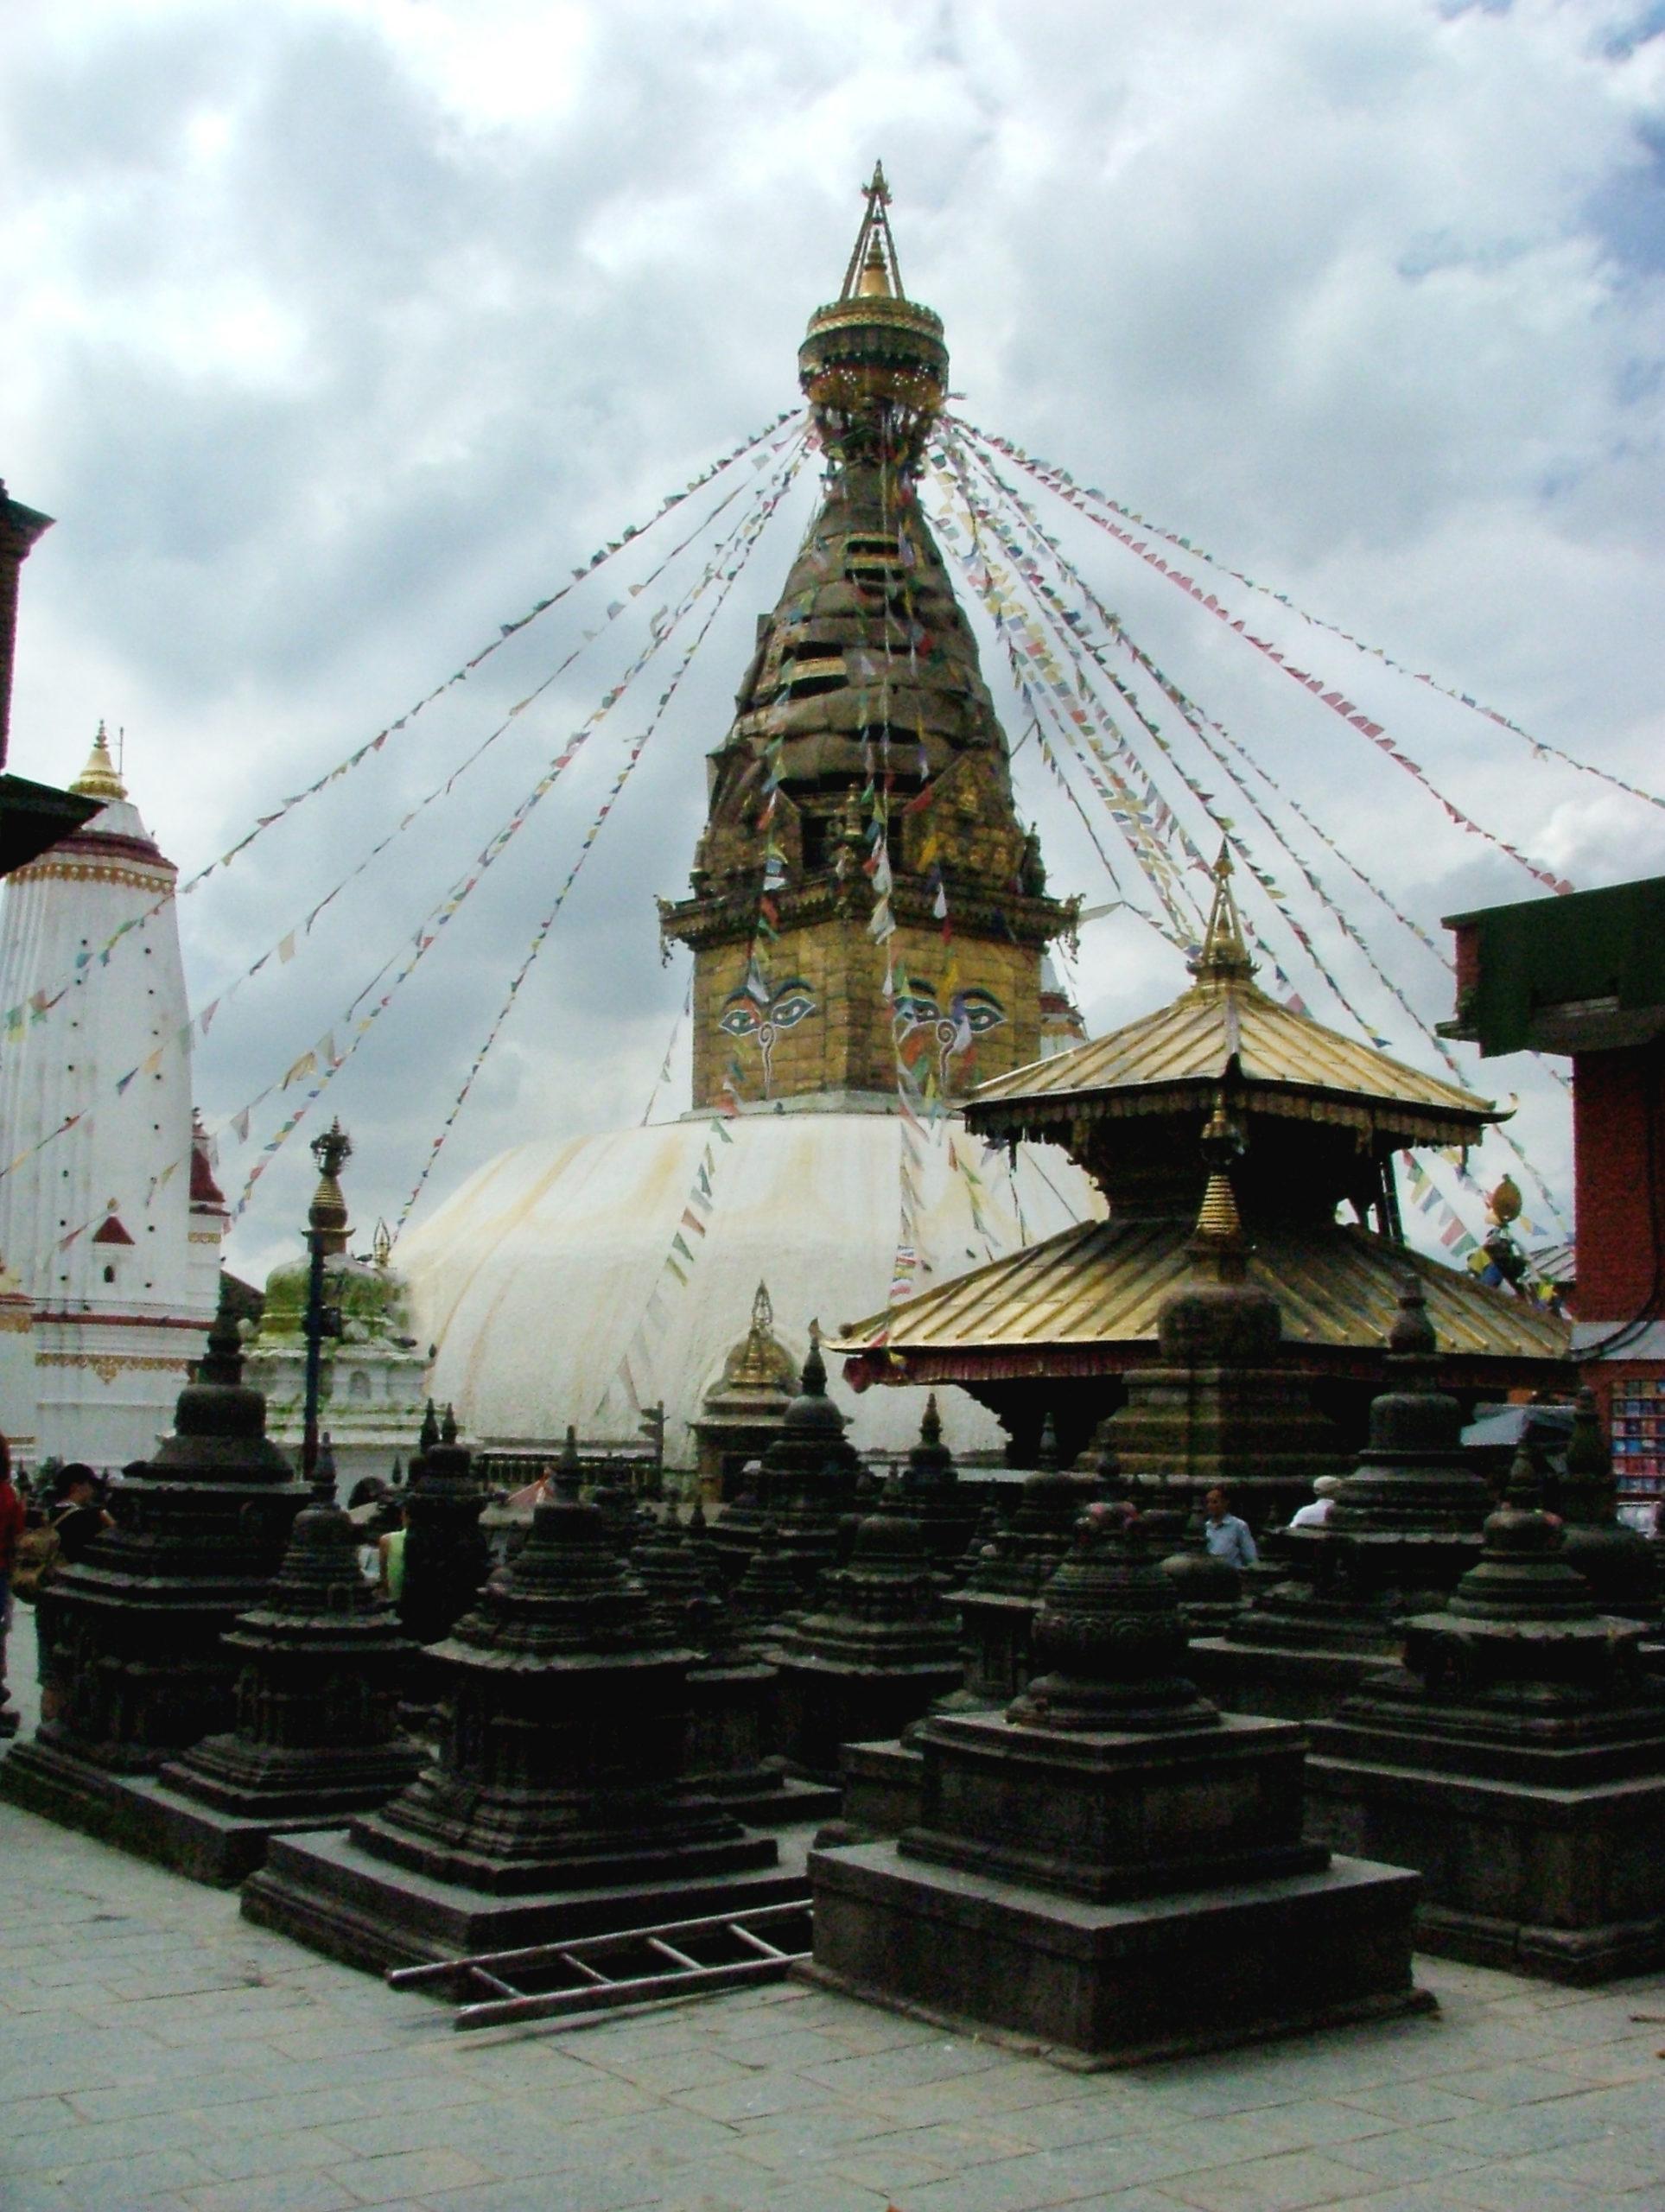 tempio di Swayambhunath